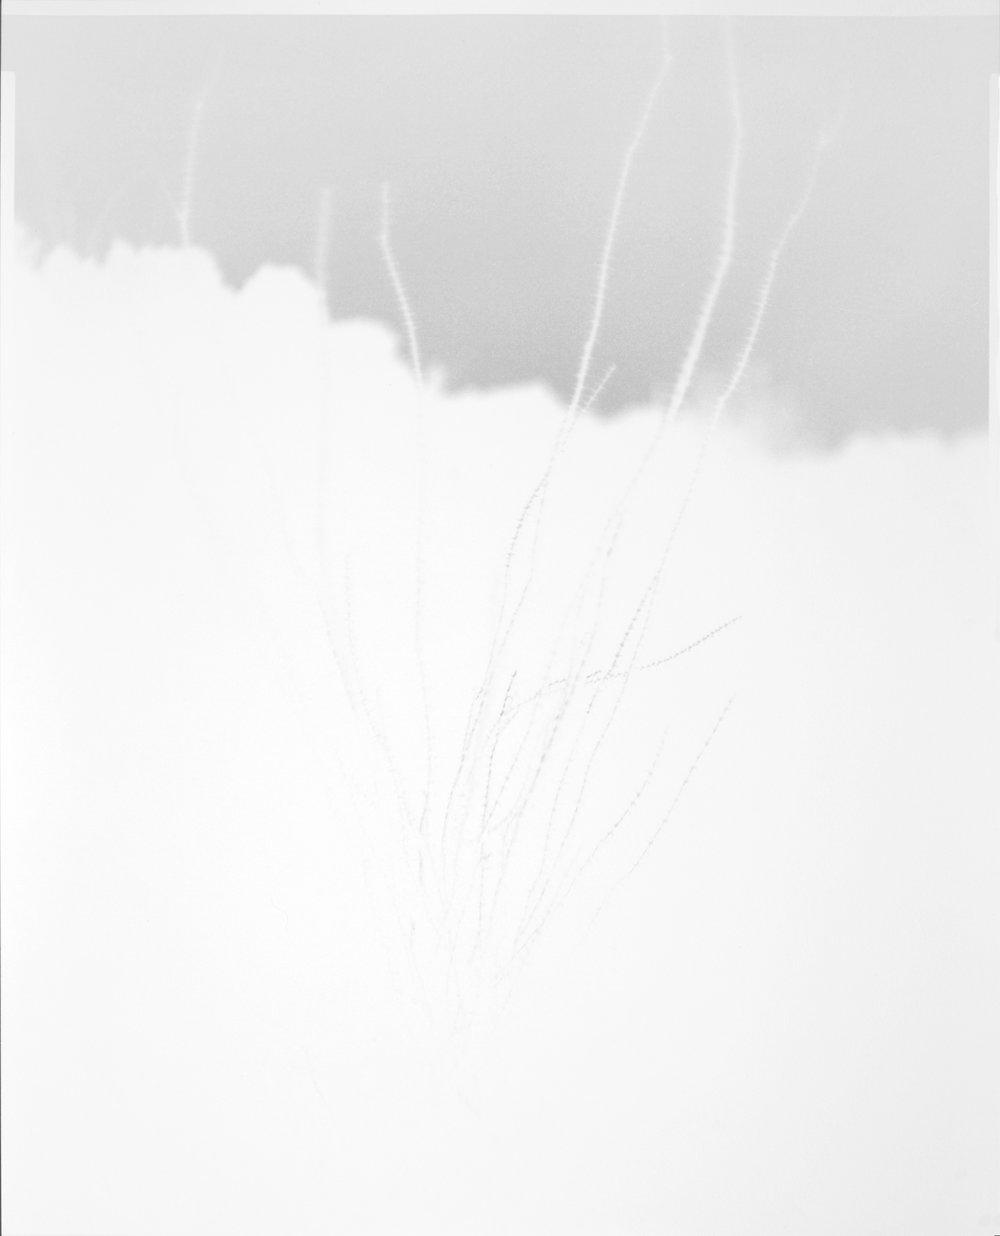 scott b. davis   ocotillo, ocotillo (no. 30),  2016   unique paper negative palladium print   20 x 16 inches